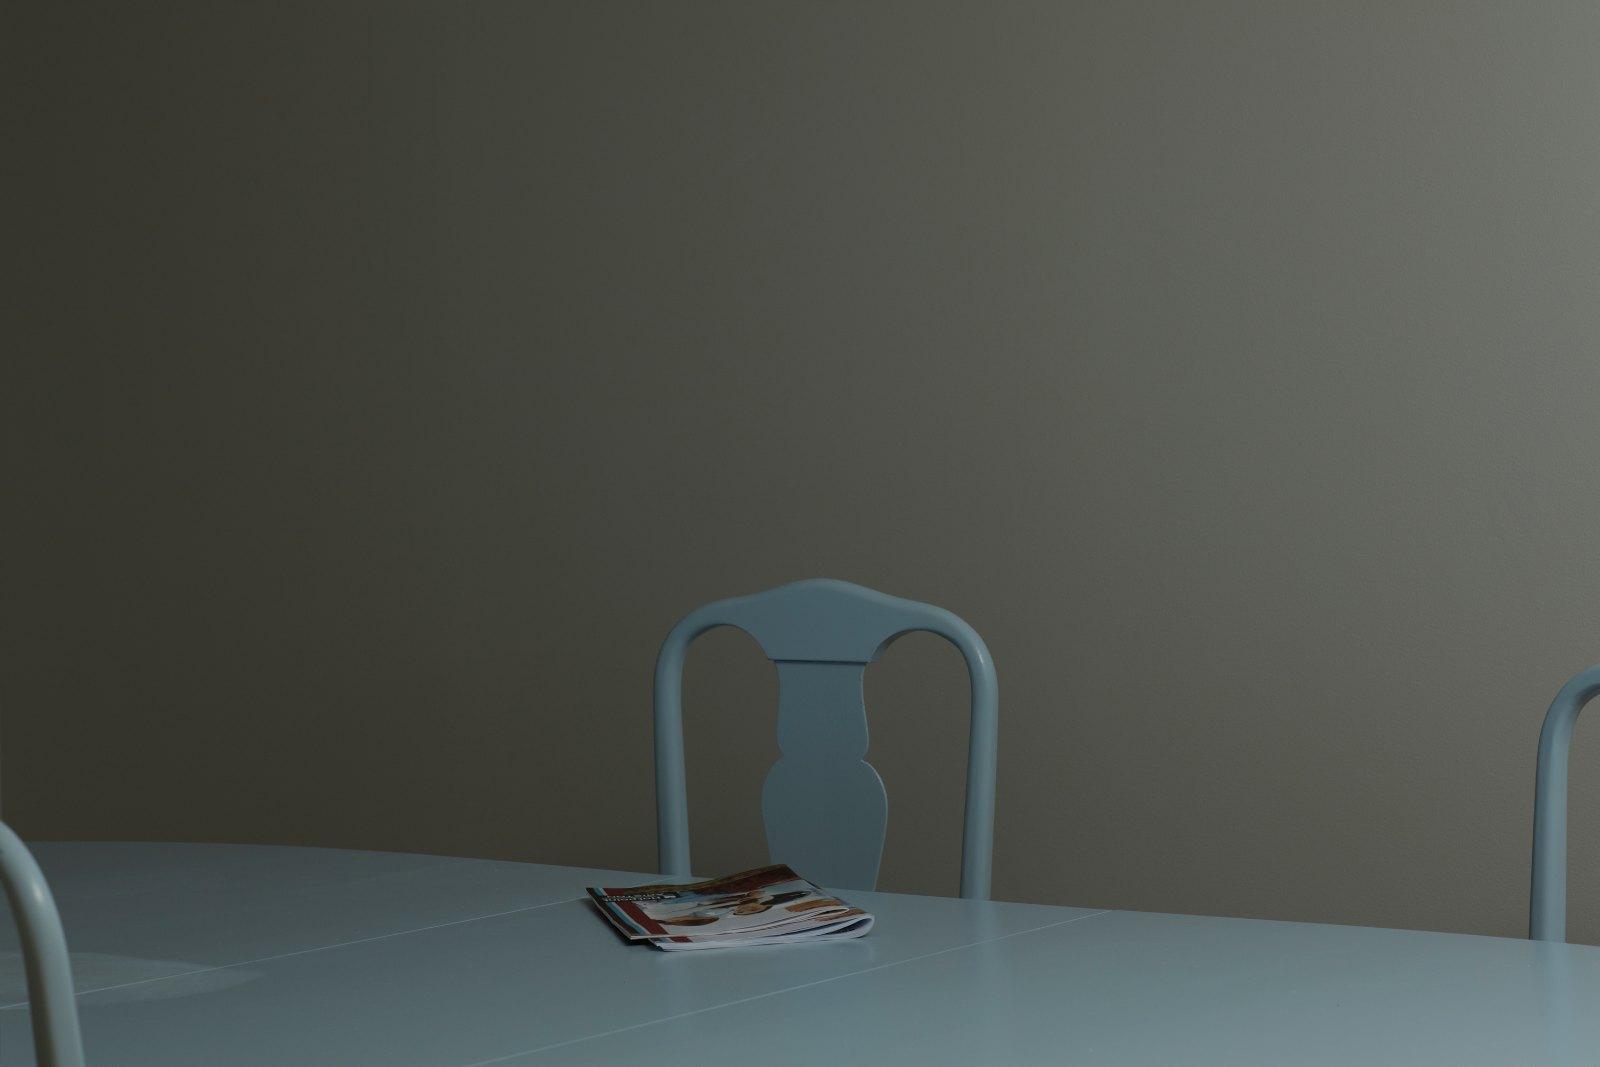 Instruction manual, 2010, giclée print, aluminium, 97,8 x 139,8 cm. Ed. 5